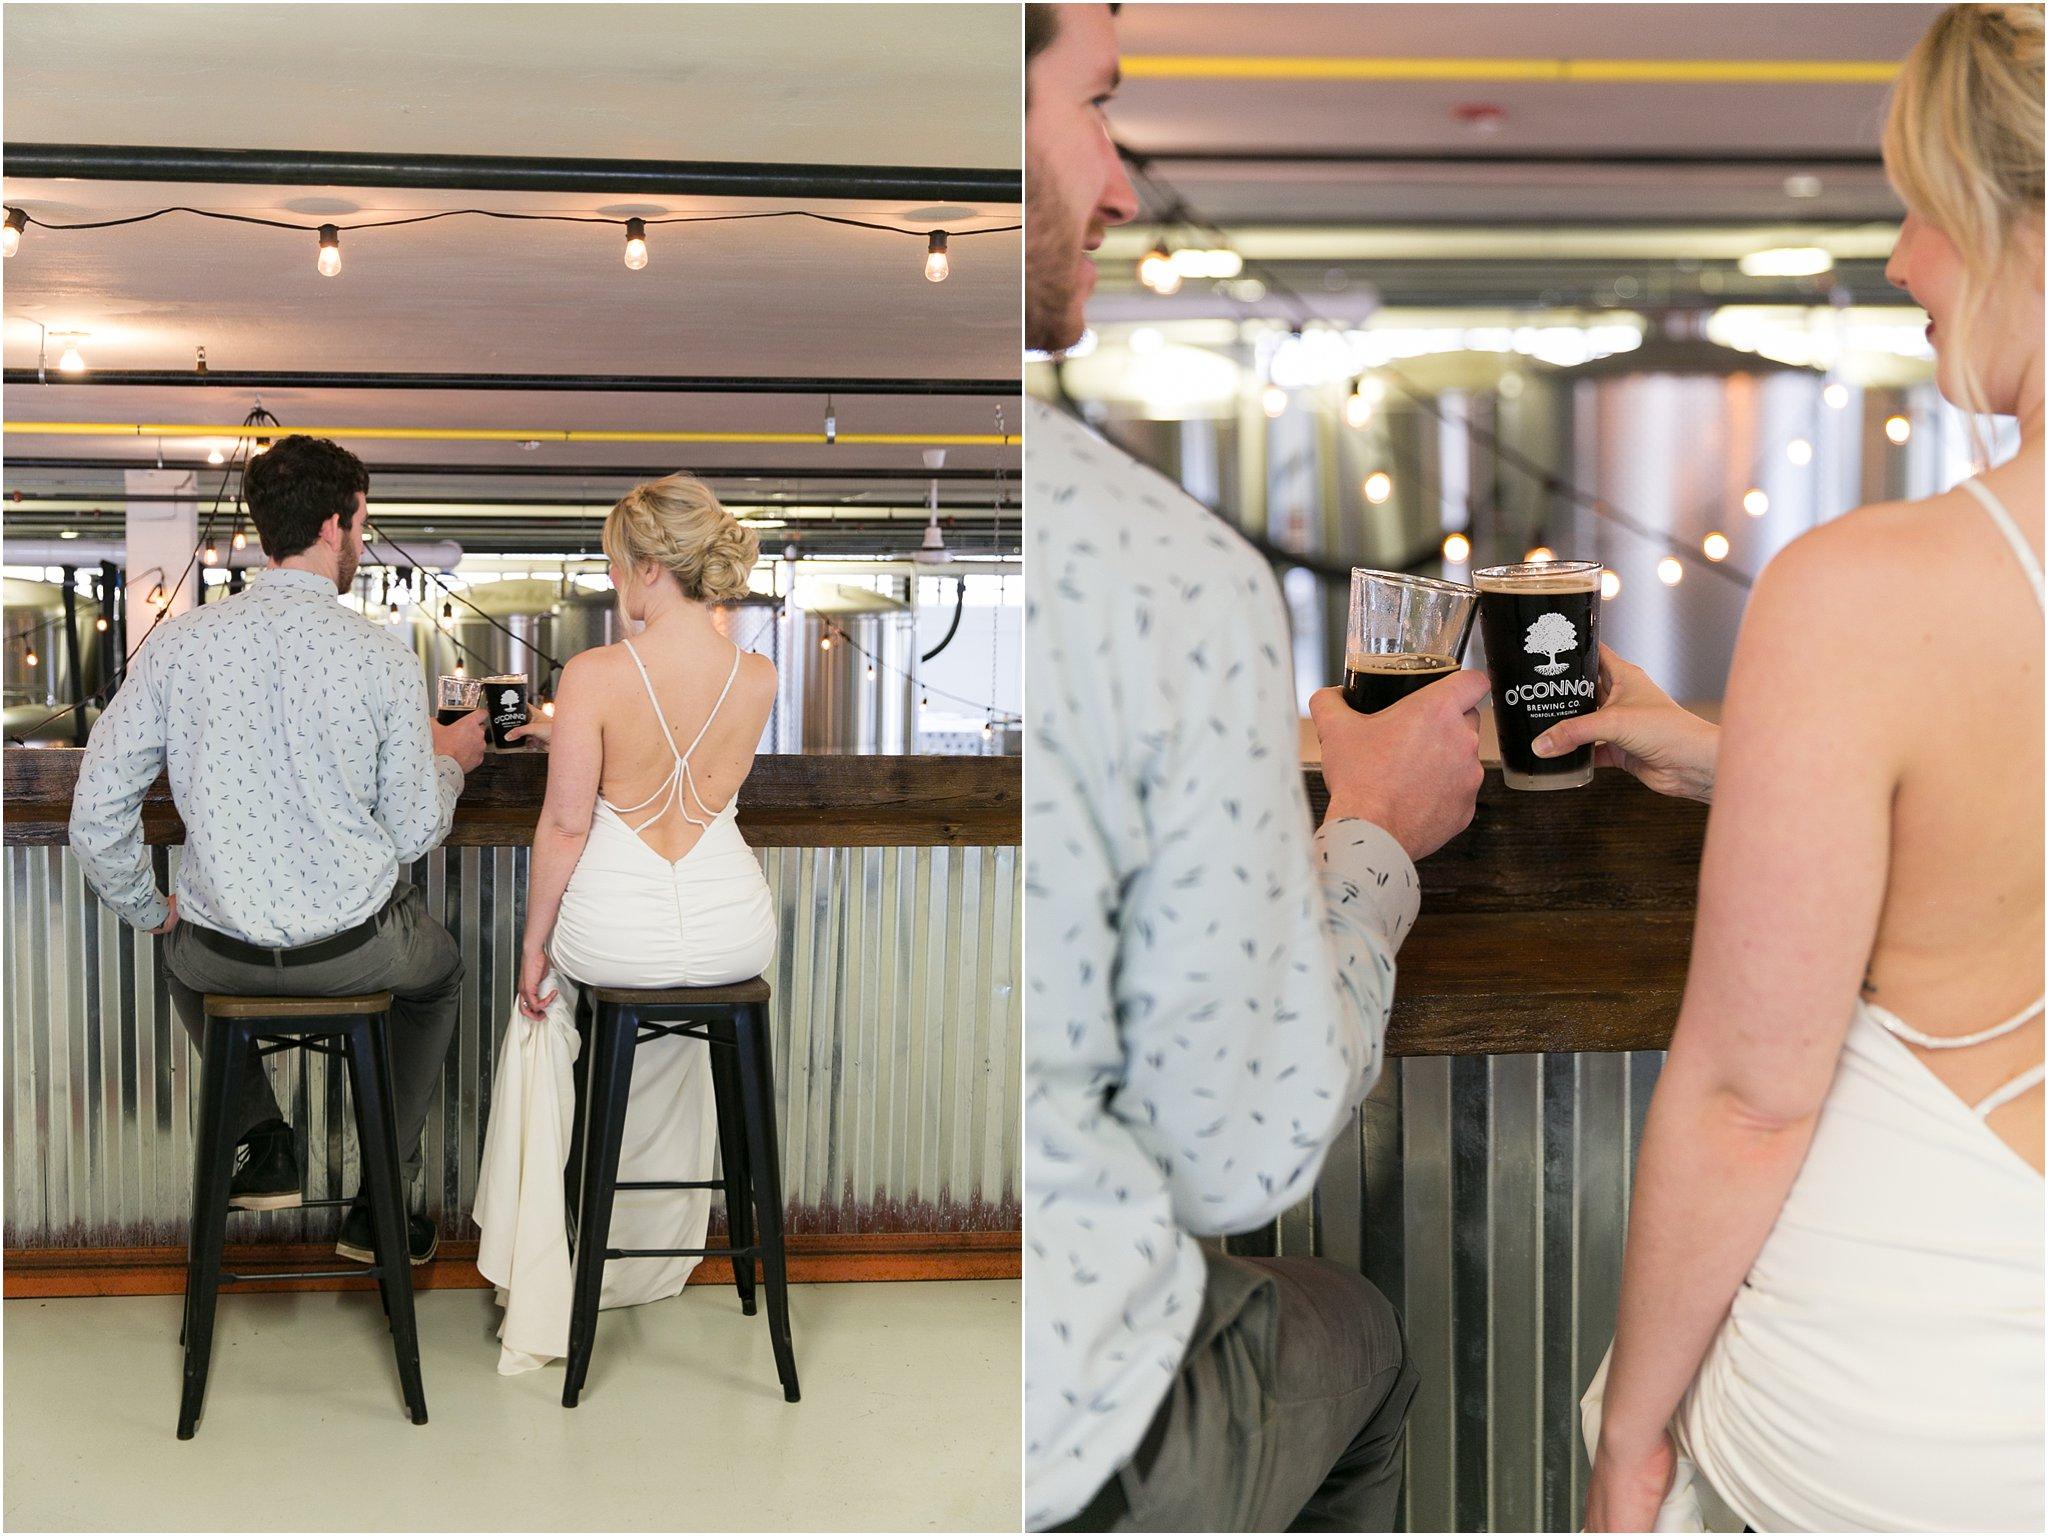 jessica_ryan_photography_oconnor_brewing_wedding_oconnor_brewing_co_norfolk_virginia_roost_flowers_blue_birds_garage__0814